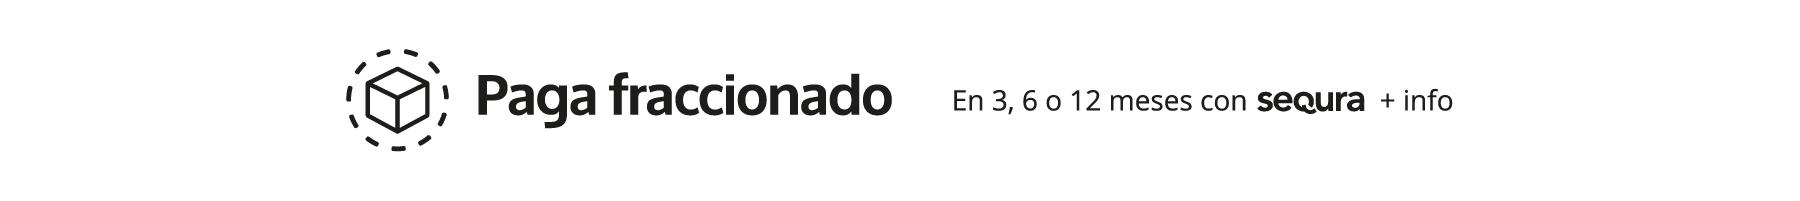 banner SQ fraccionado_negro_pos_900x100@2x